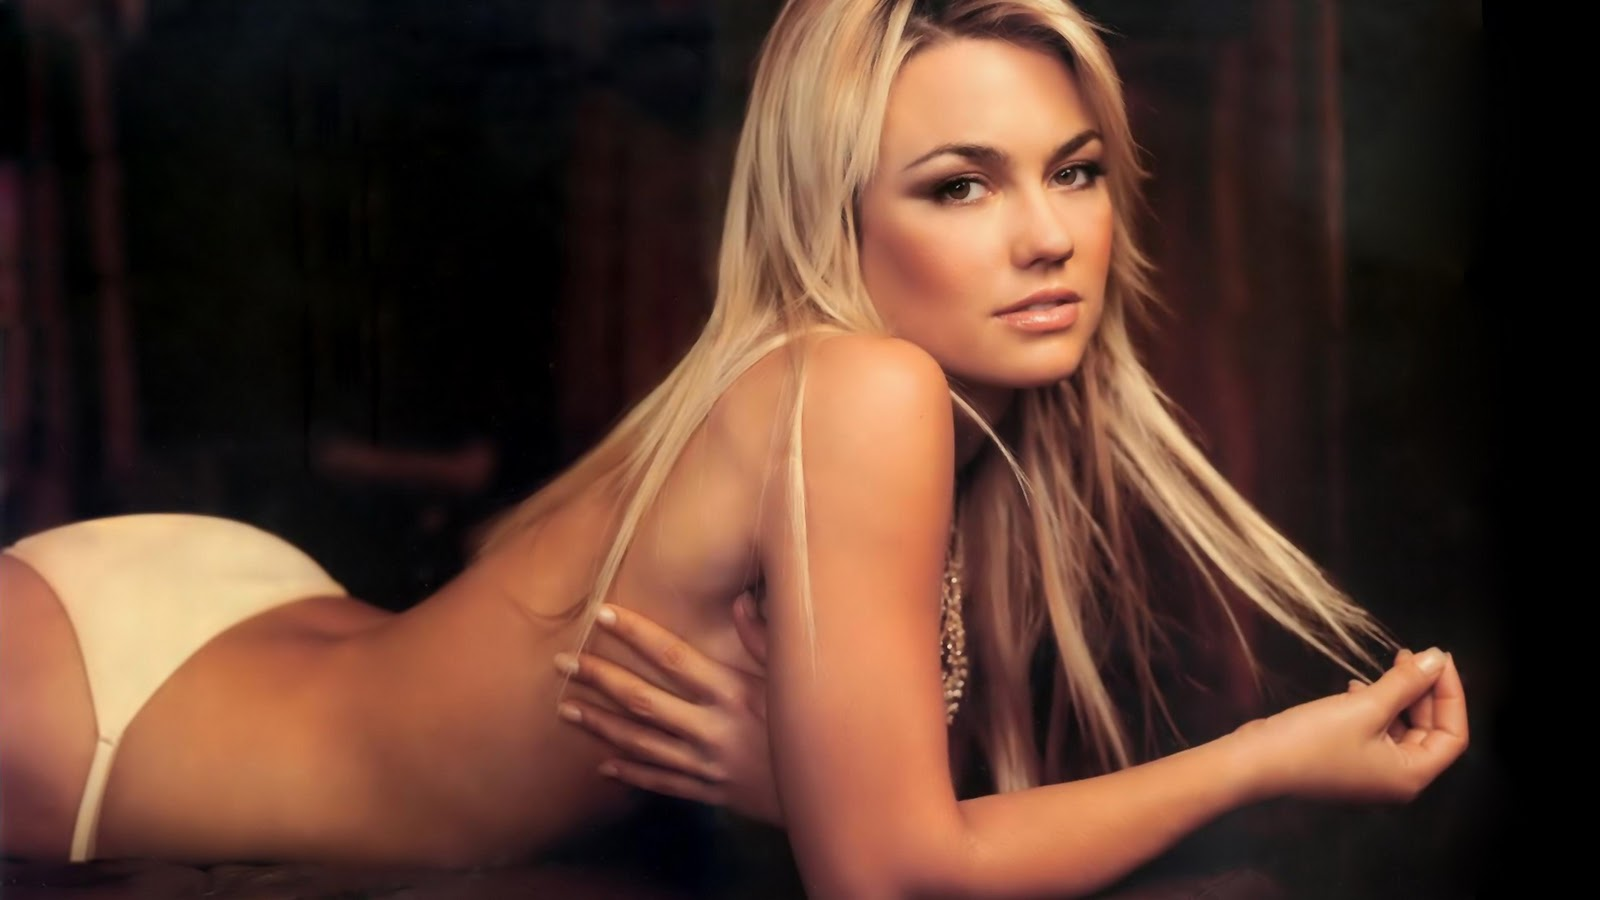 Hot Sexi Woman 67